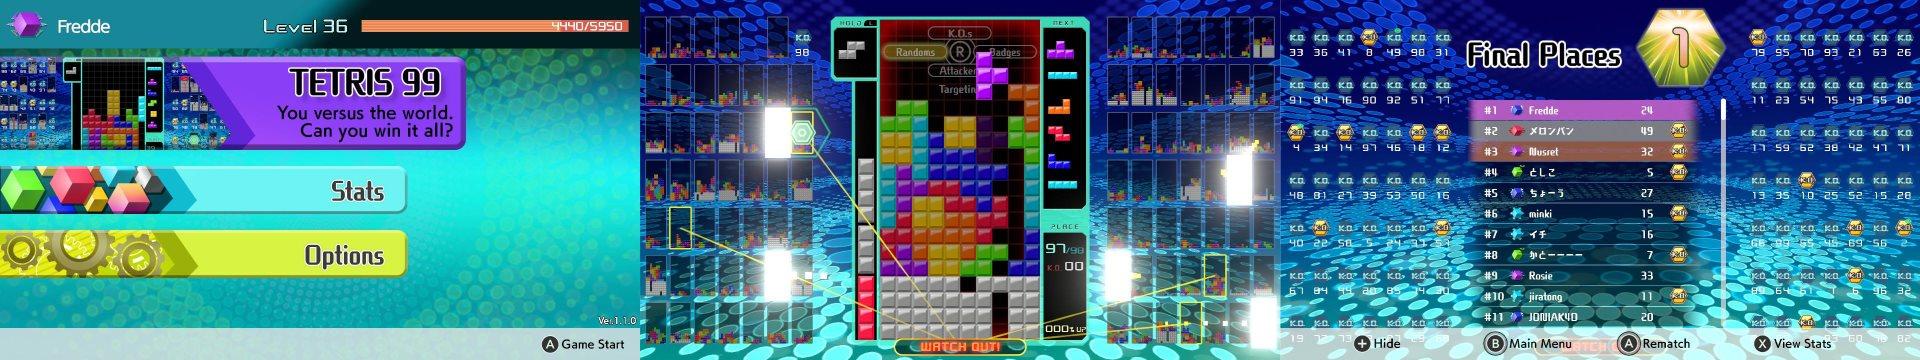 7 tetris99